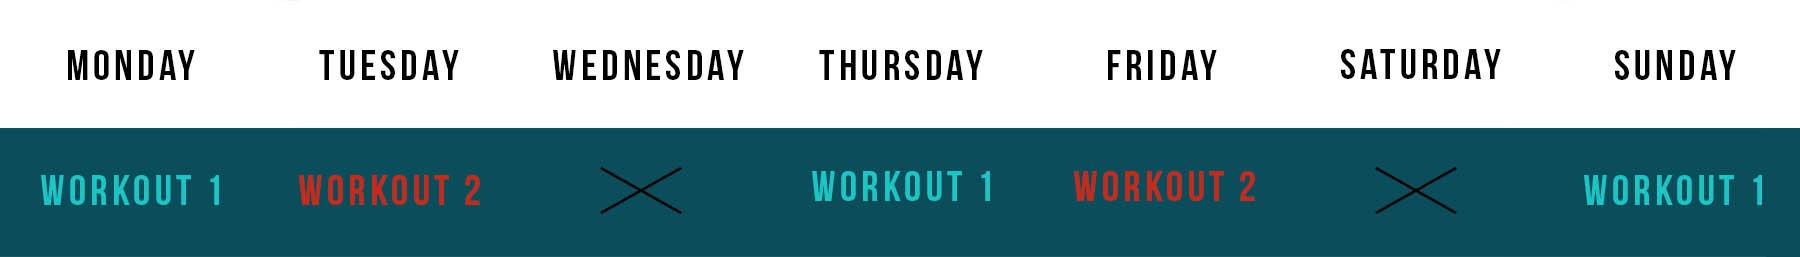 Aquaman workout schedule